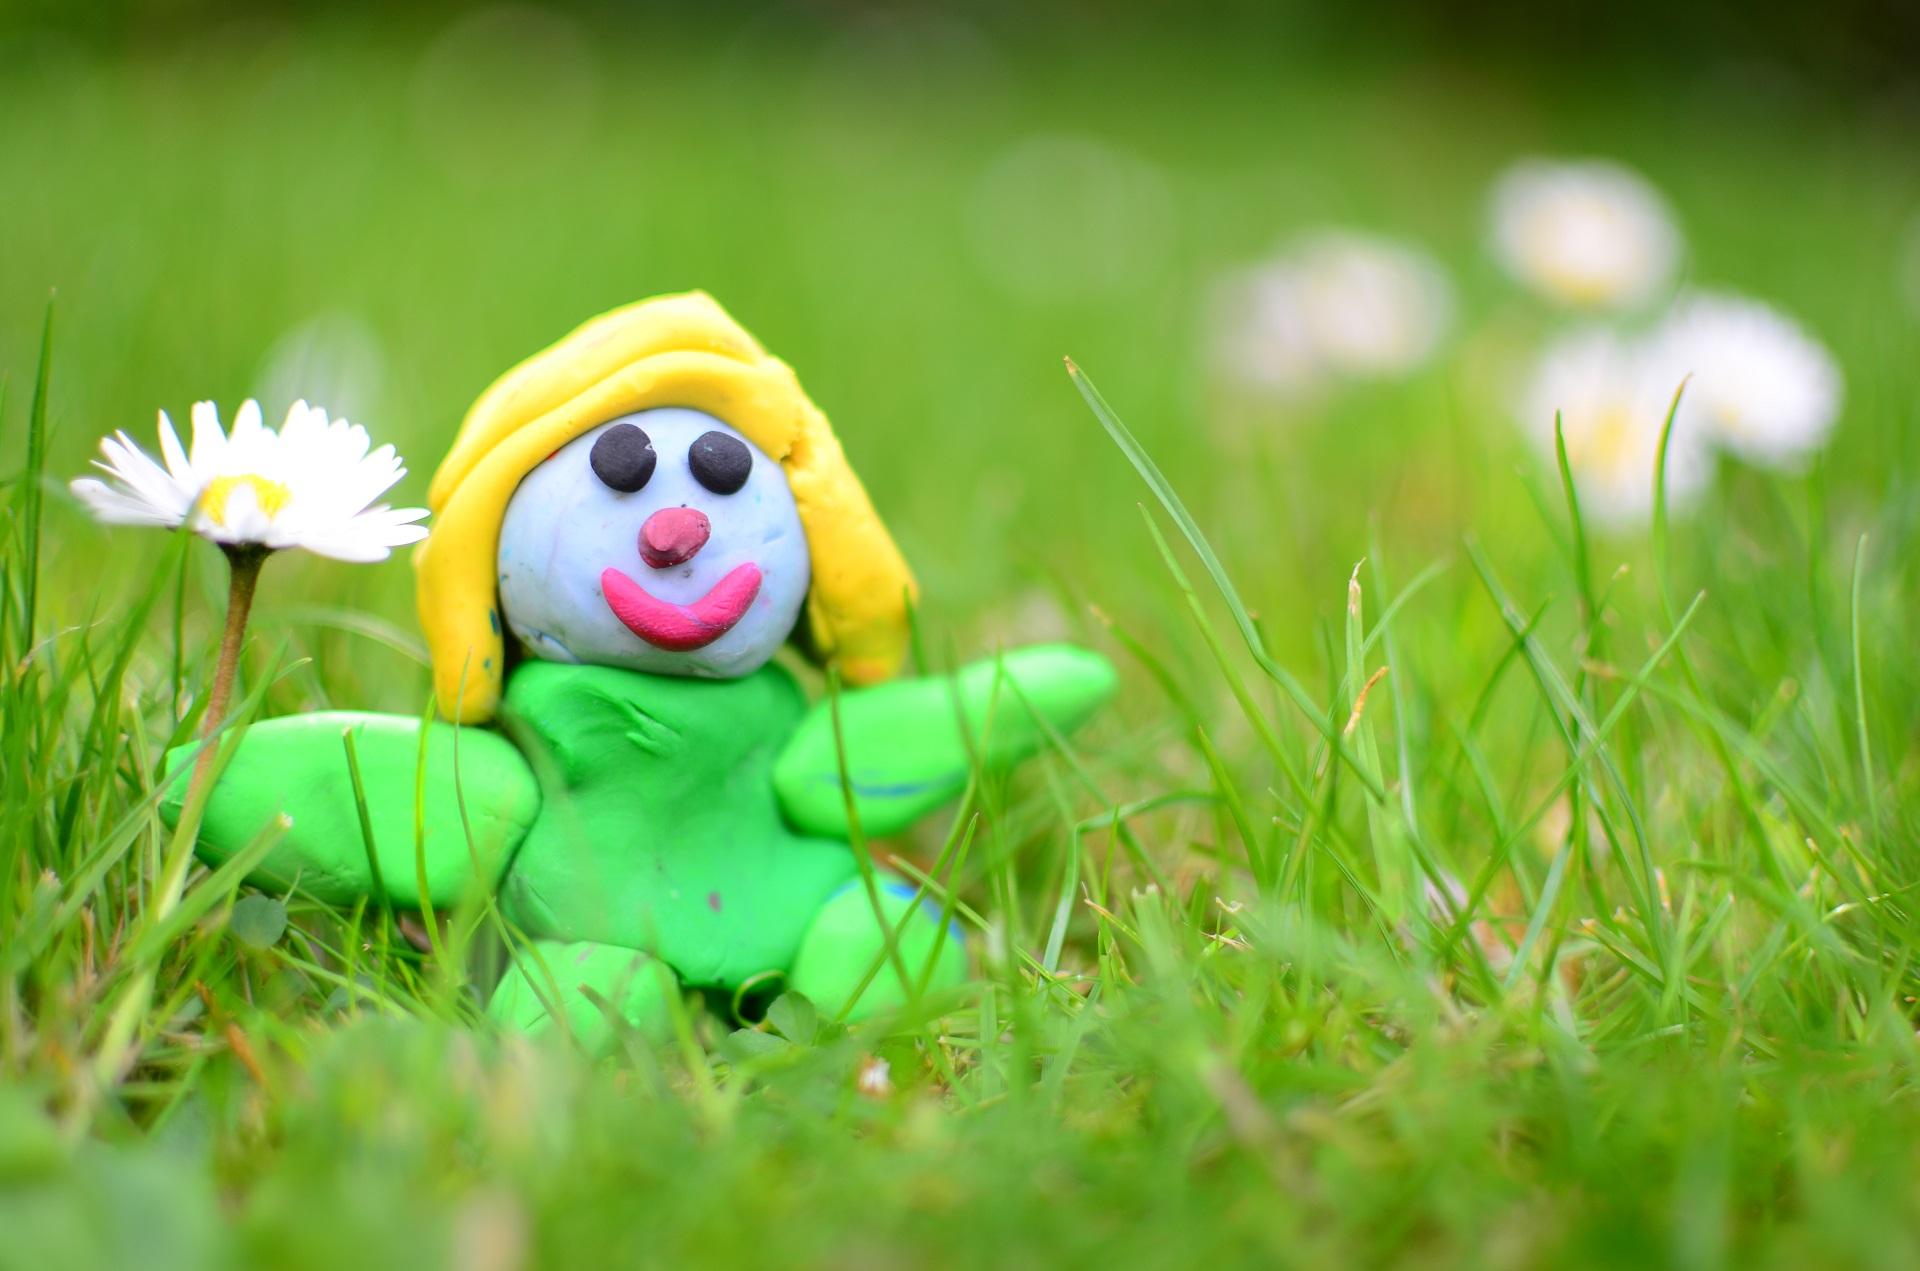 Clay model of Emma sitting amongst flowers